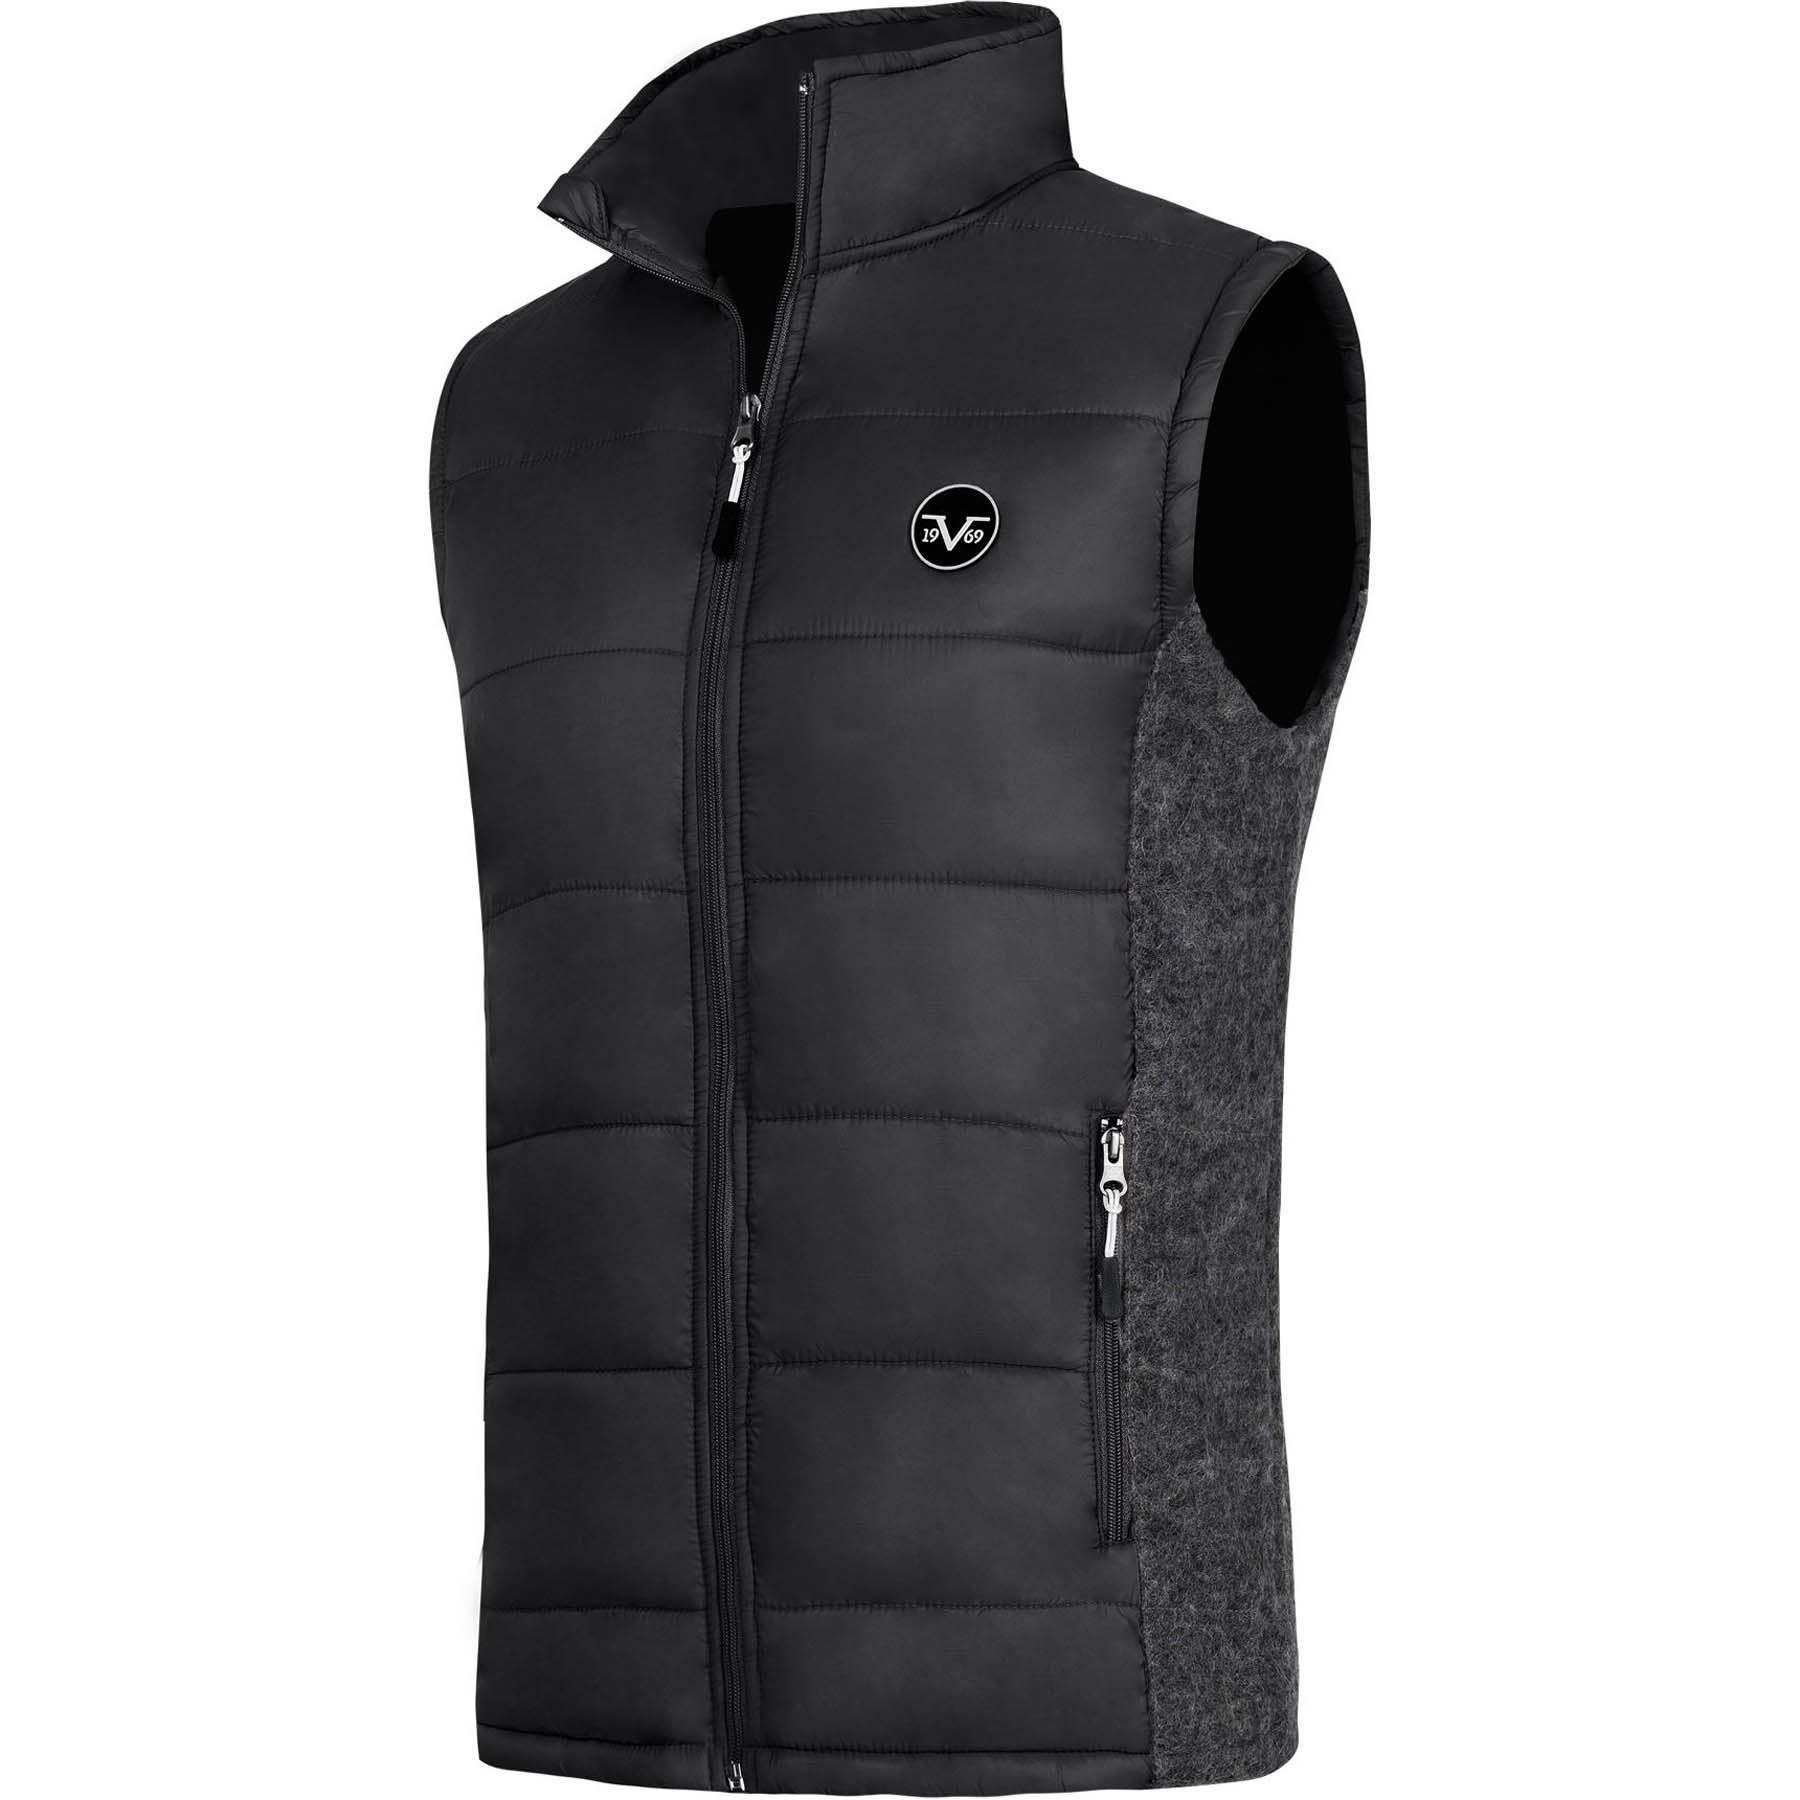 84cef6d134cd 19V69 winter vest men M black